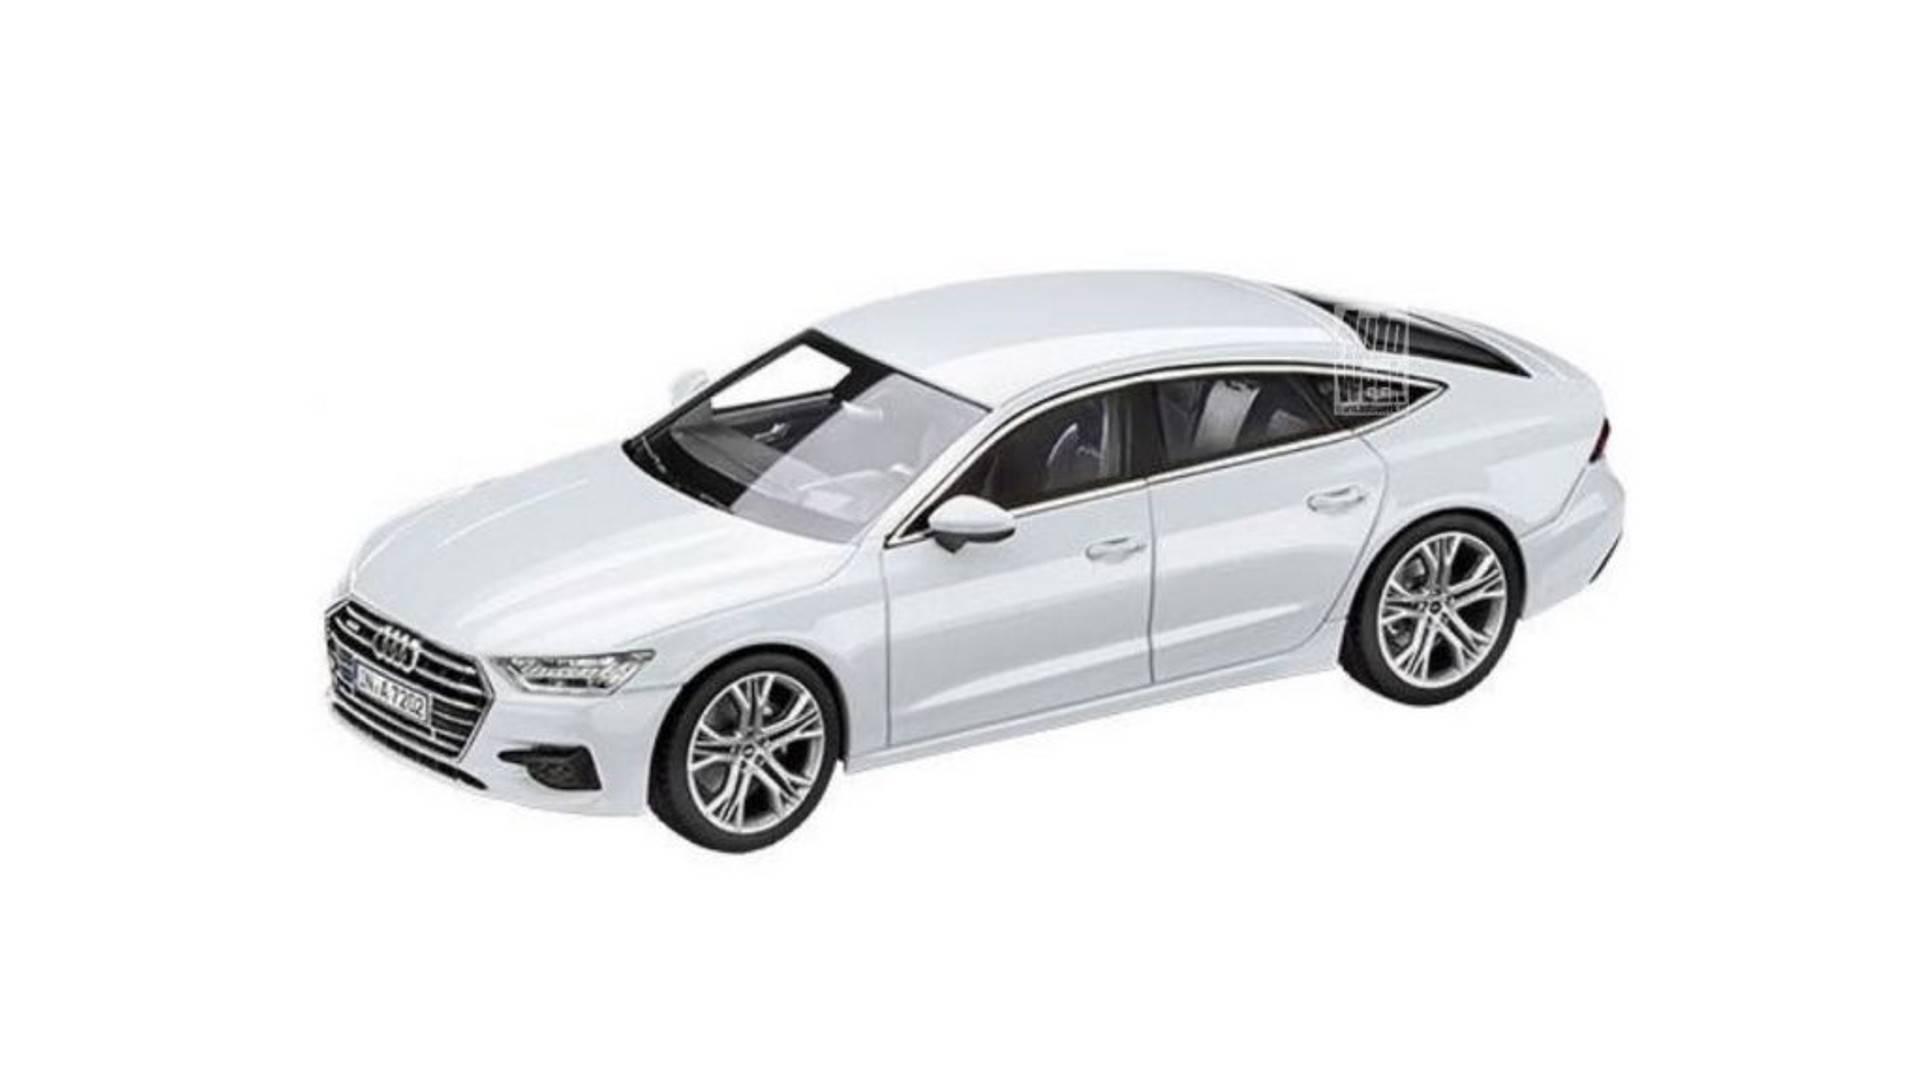 ¡Filtrado! Nuevo Audi A7 Sportback